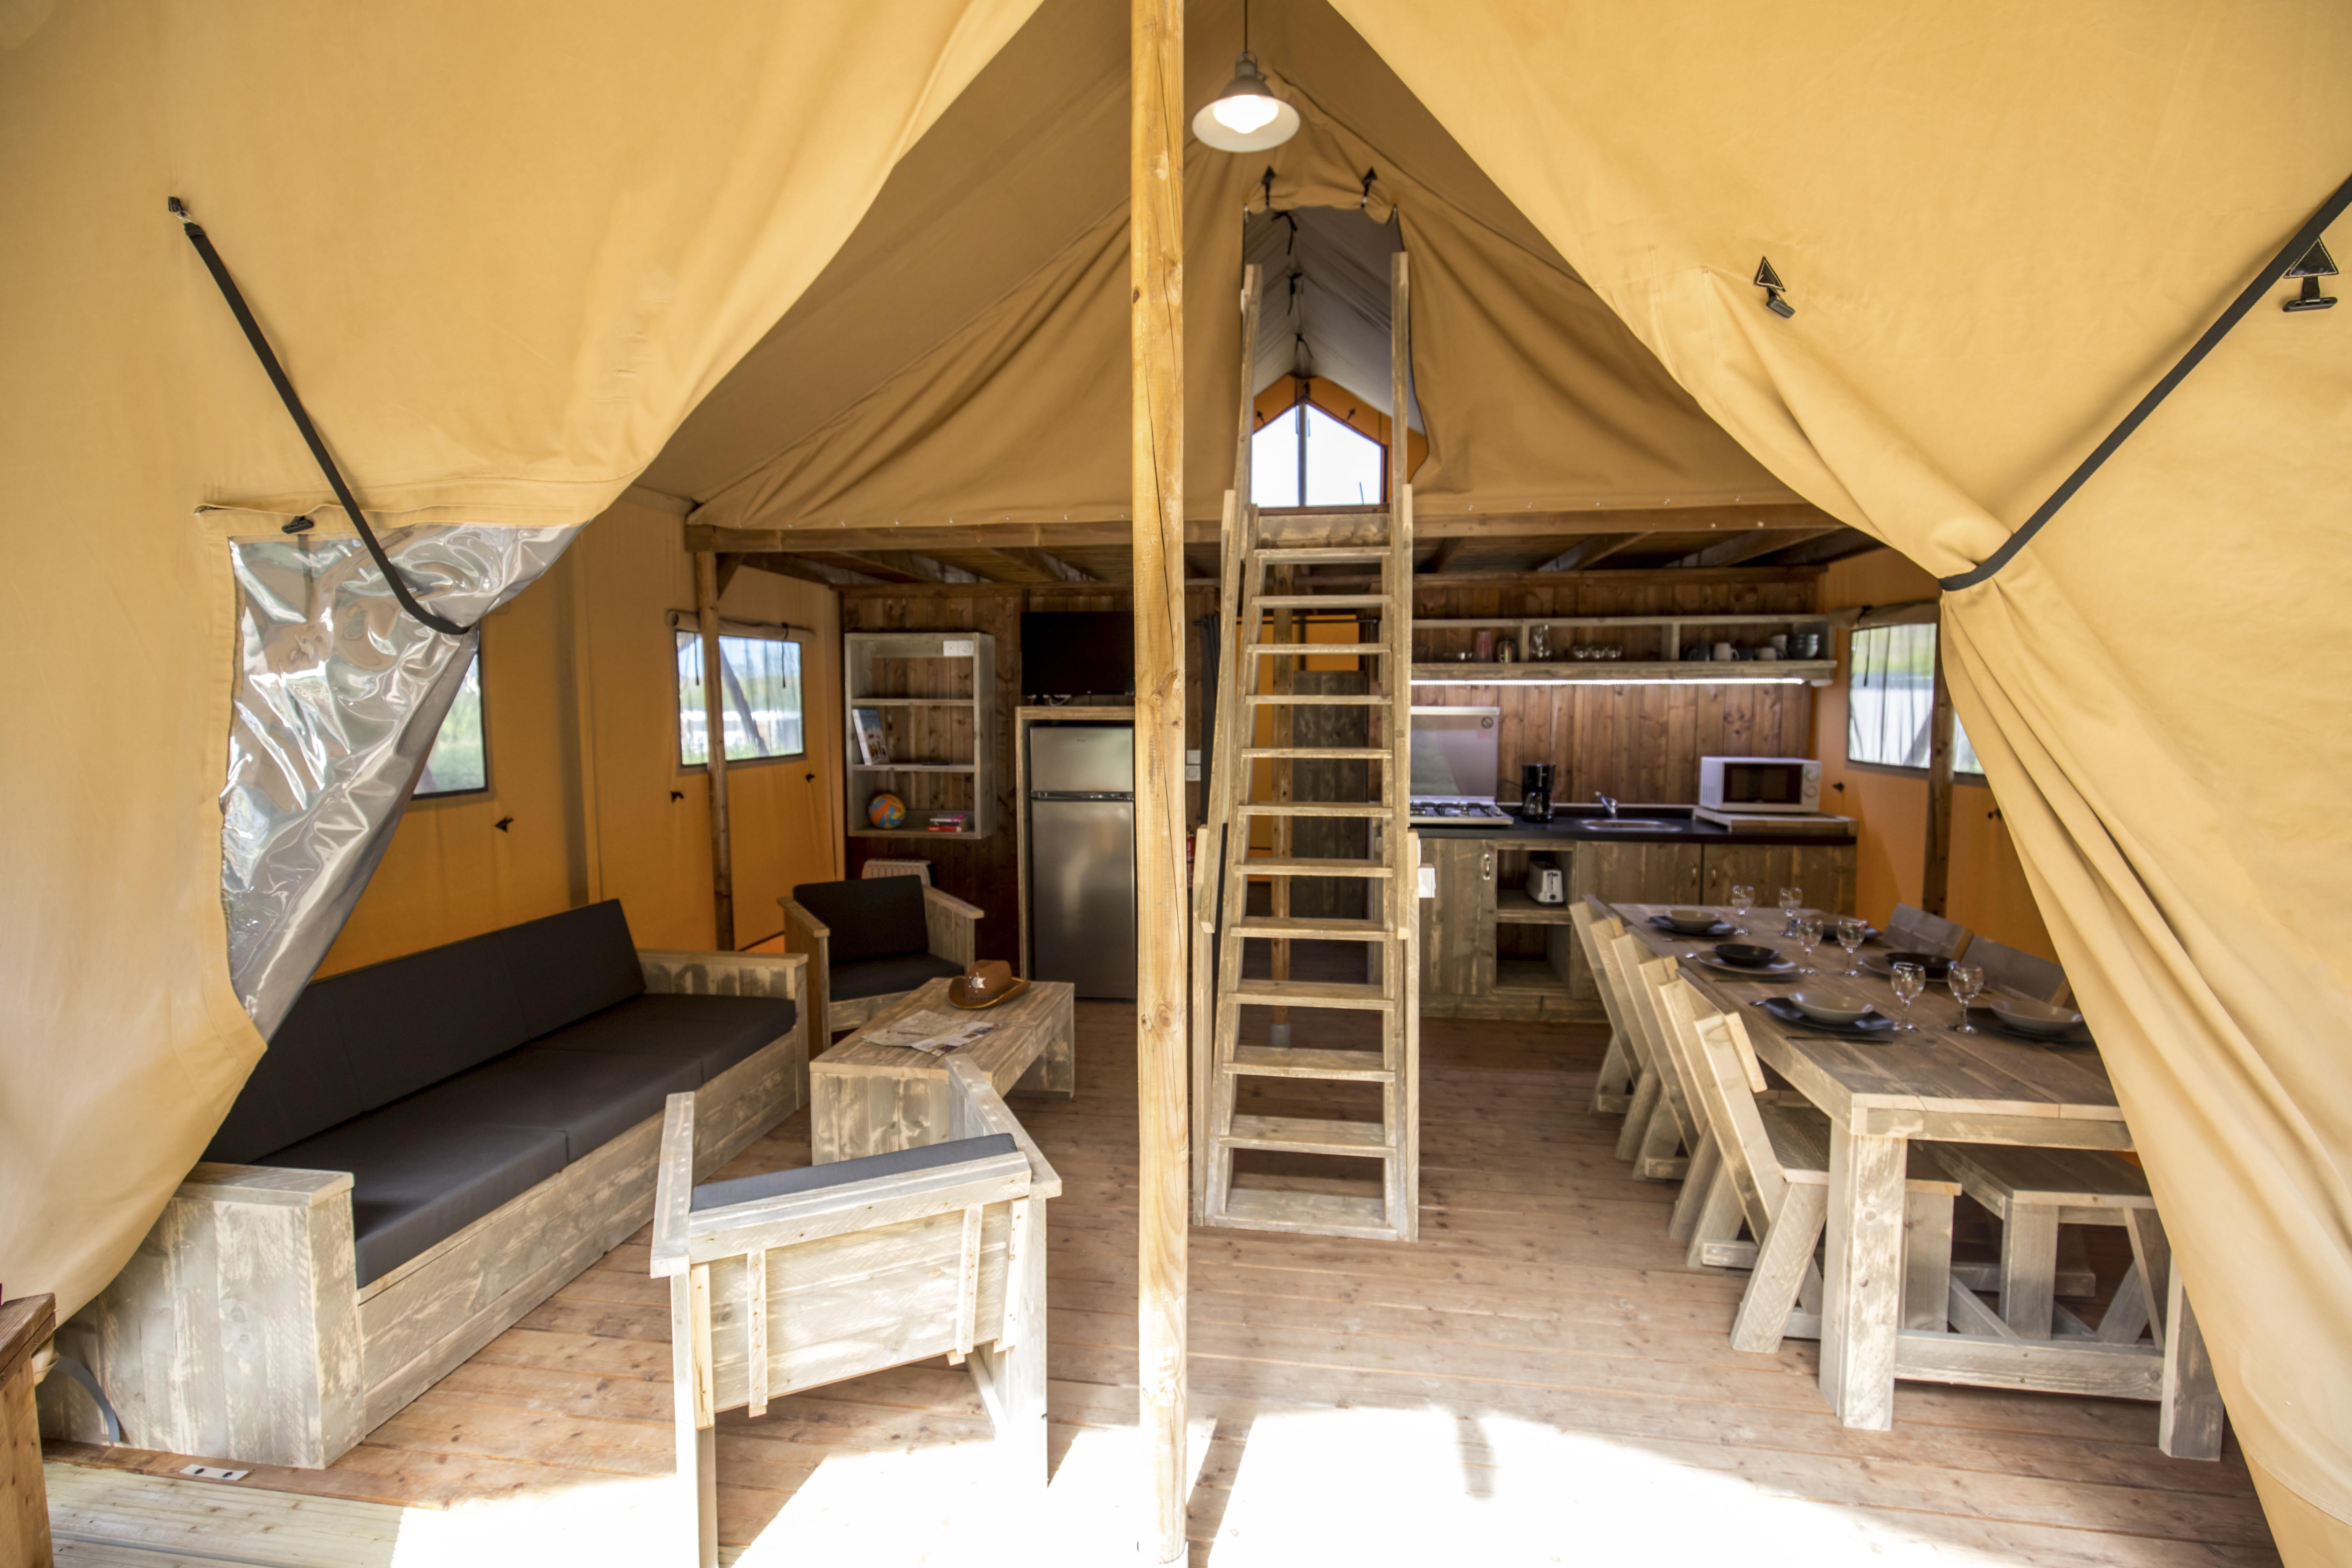 Location - Glamping Lodge 37.8 M² - 2 Chambres - 1 Salle De Bain. Samedi - Camping L'Anse du Brick